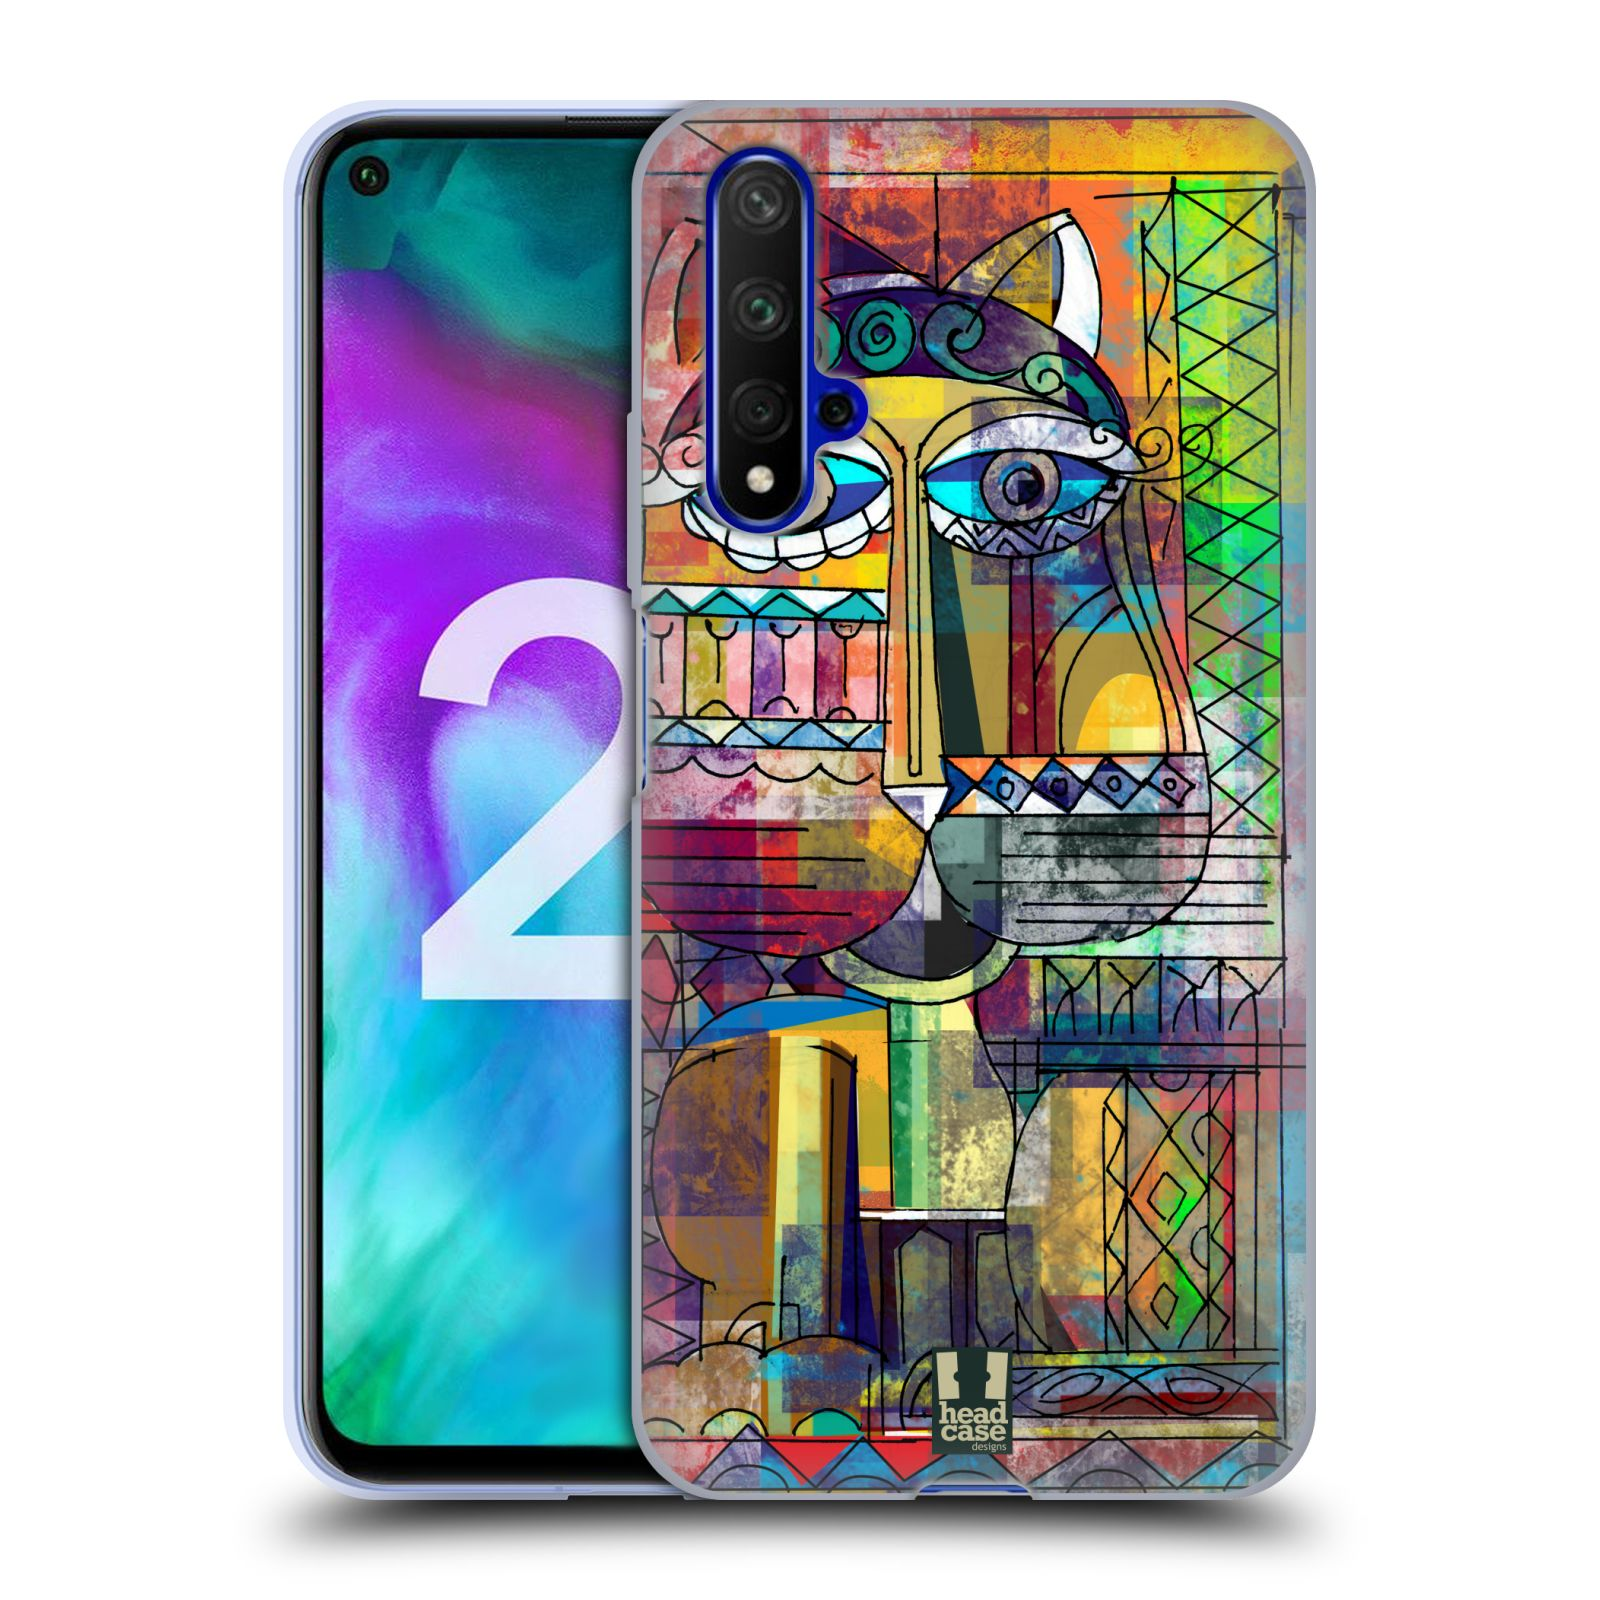 Silikonové pouzdro na mobil Honor 20 - Head Case - AZTEC KORAT